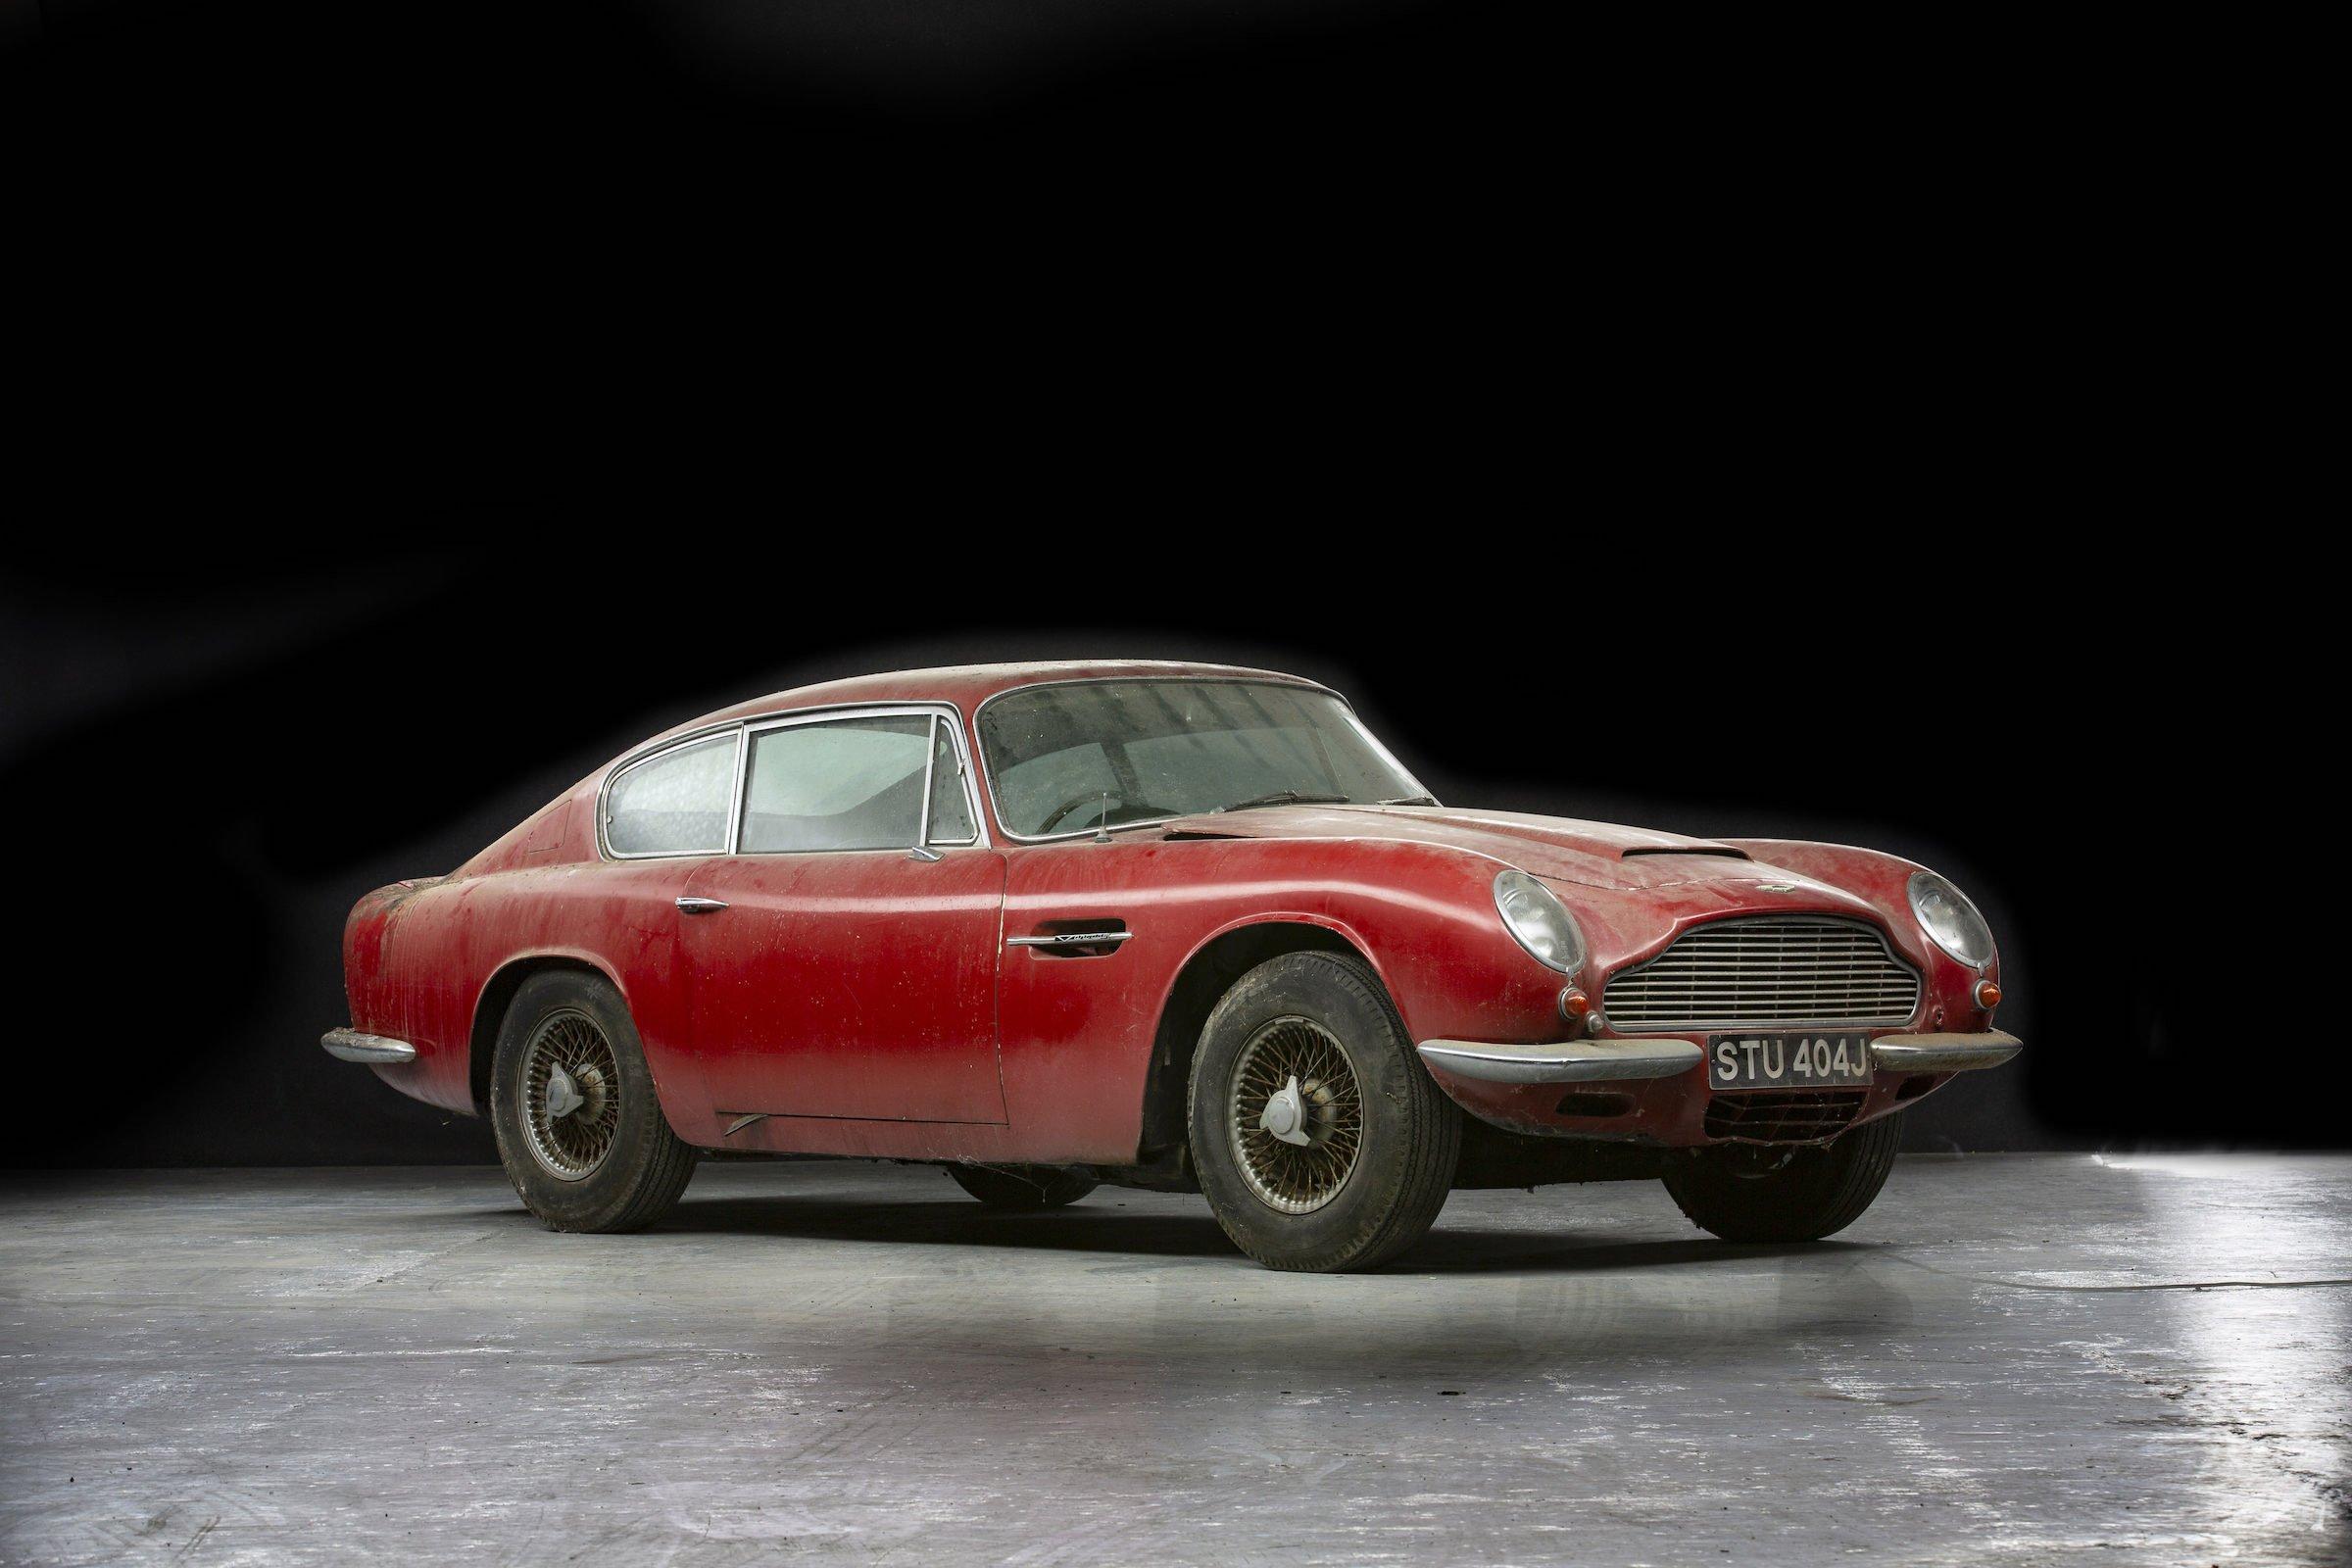 Aston Martin DB6 Vantage